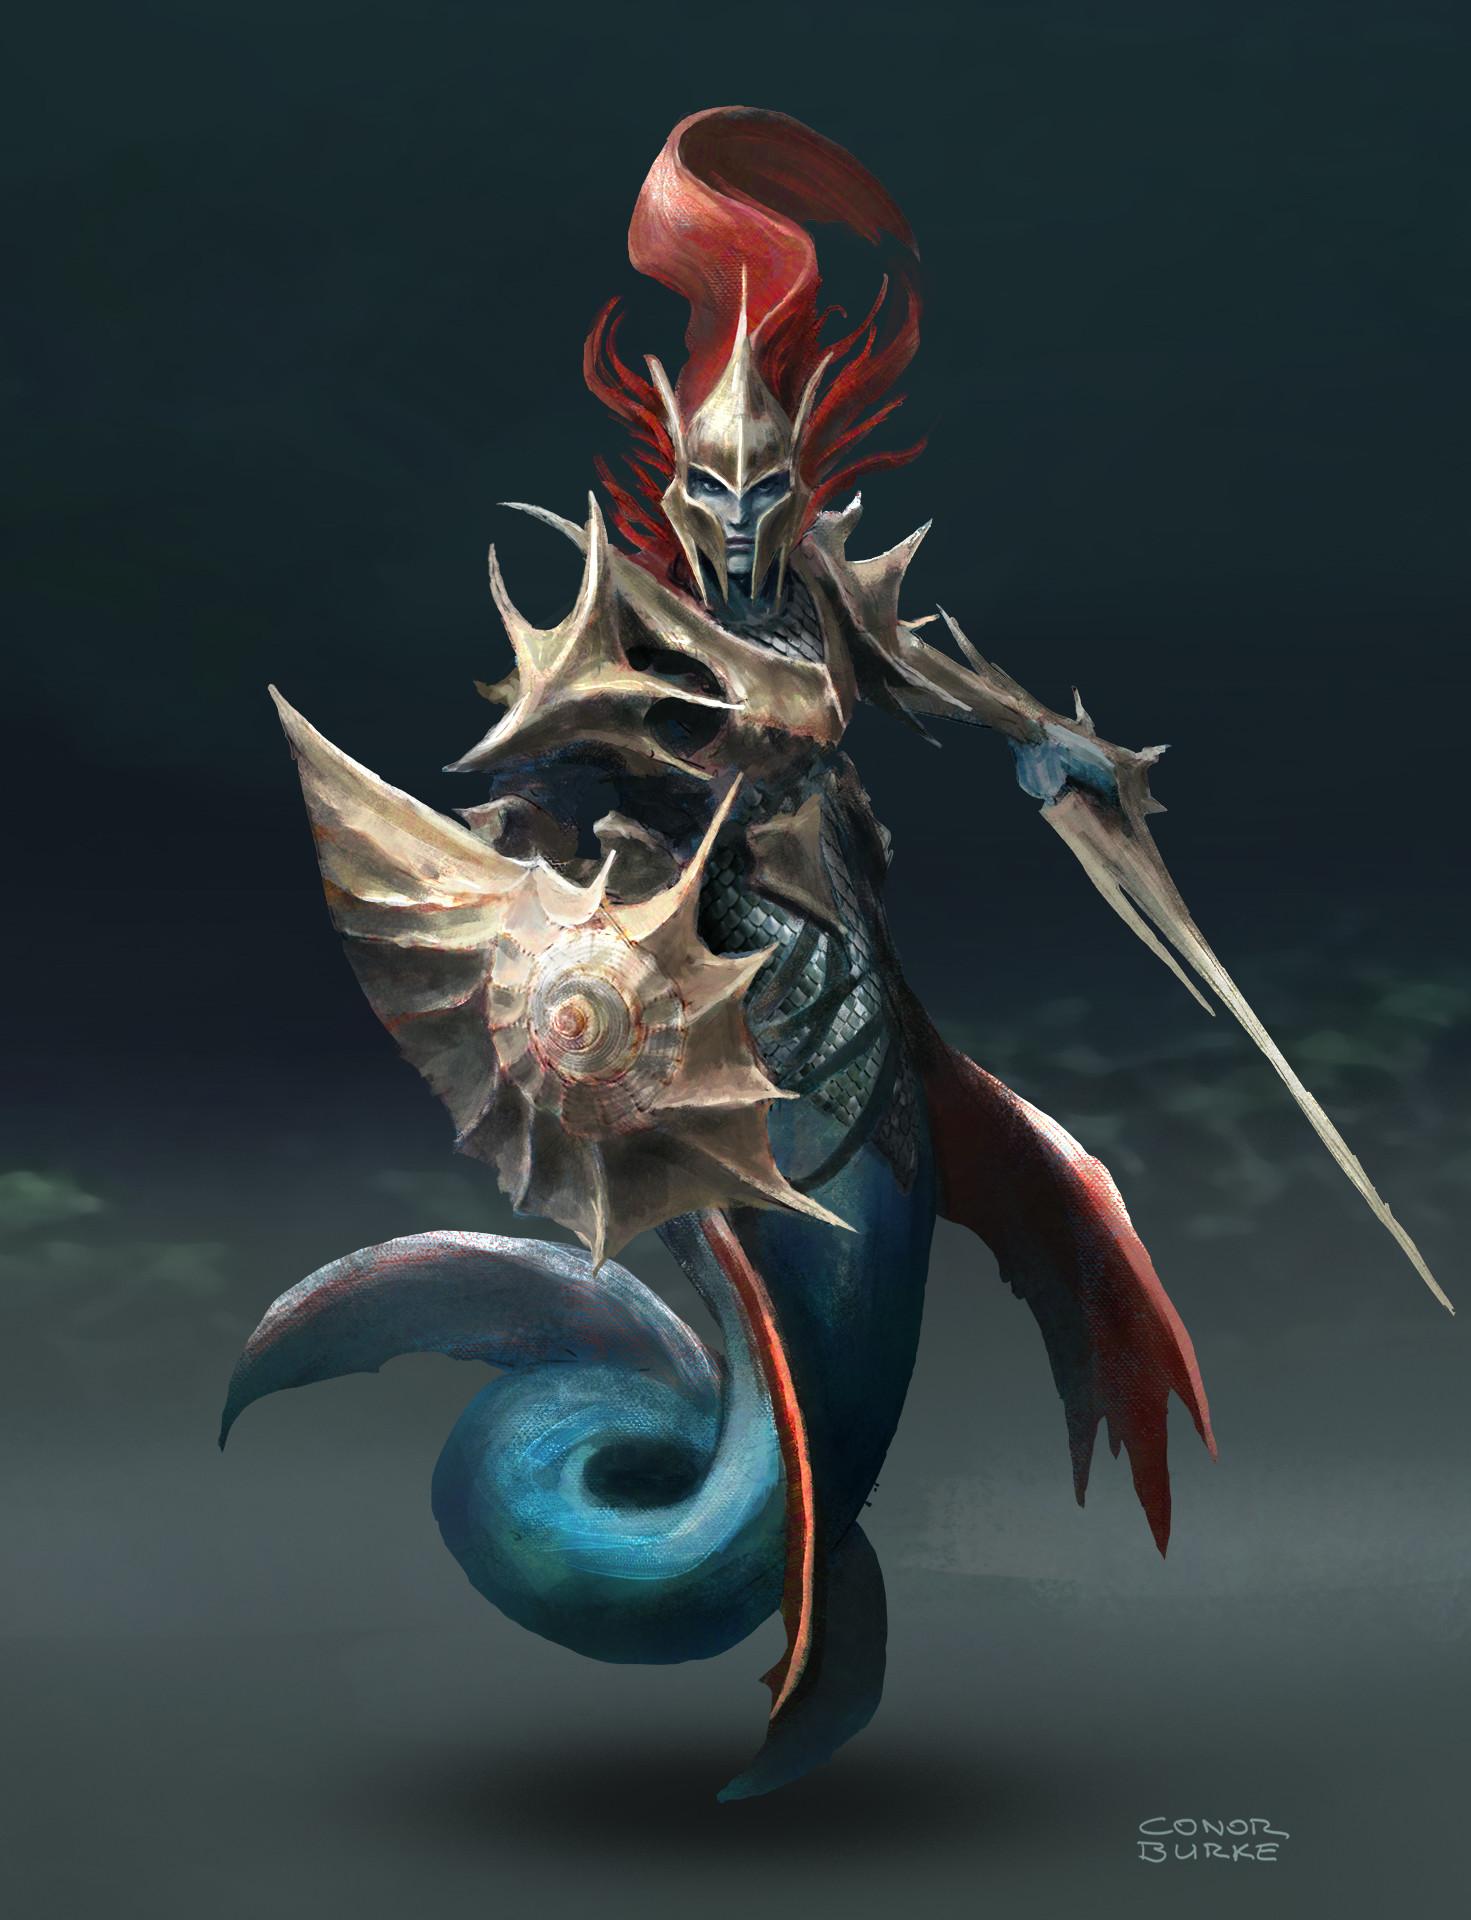 Conor burke conor burke btw denizen mermaid